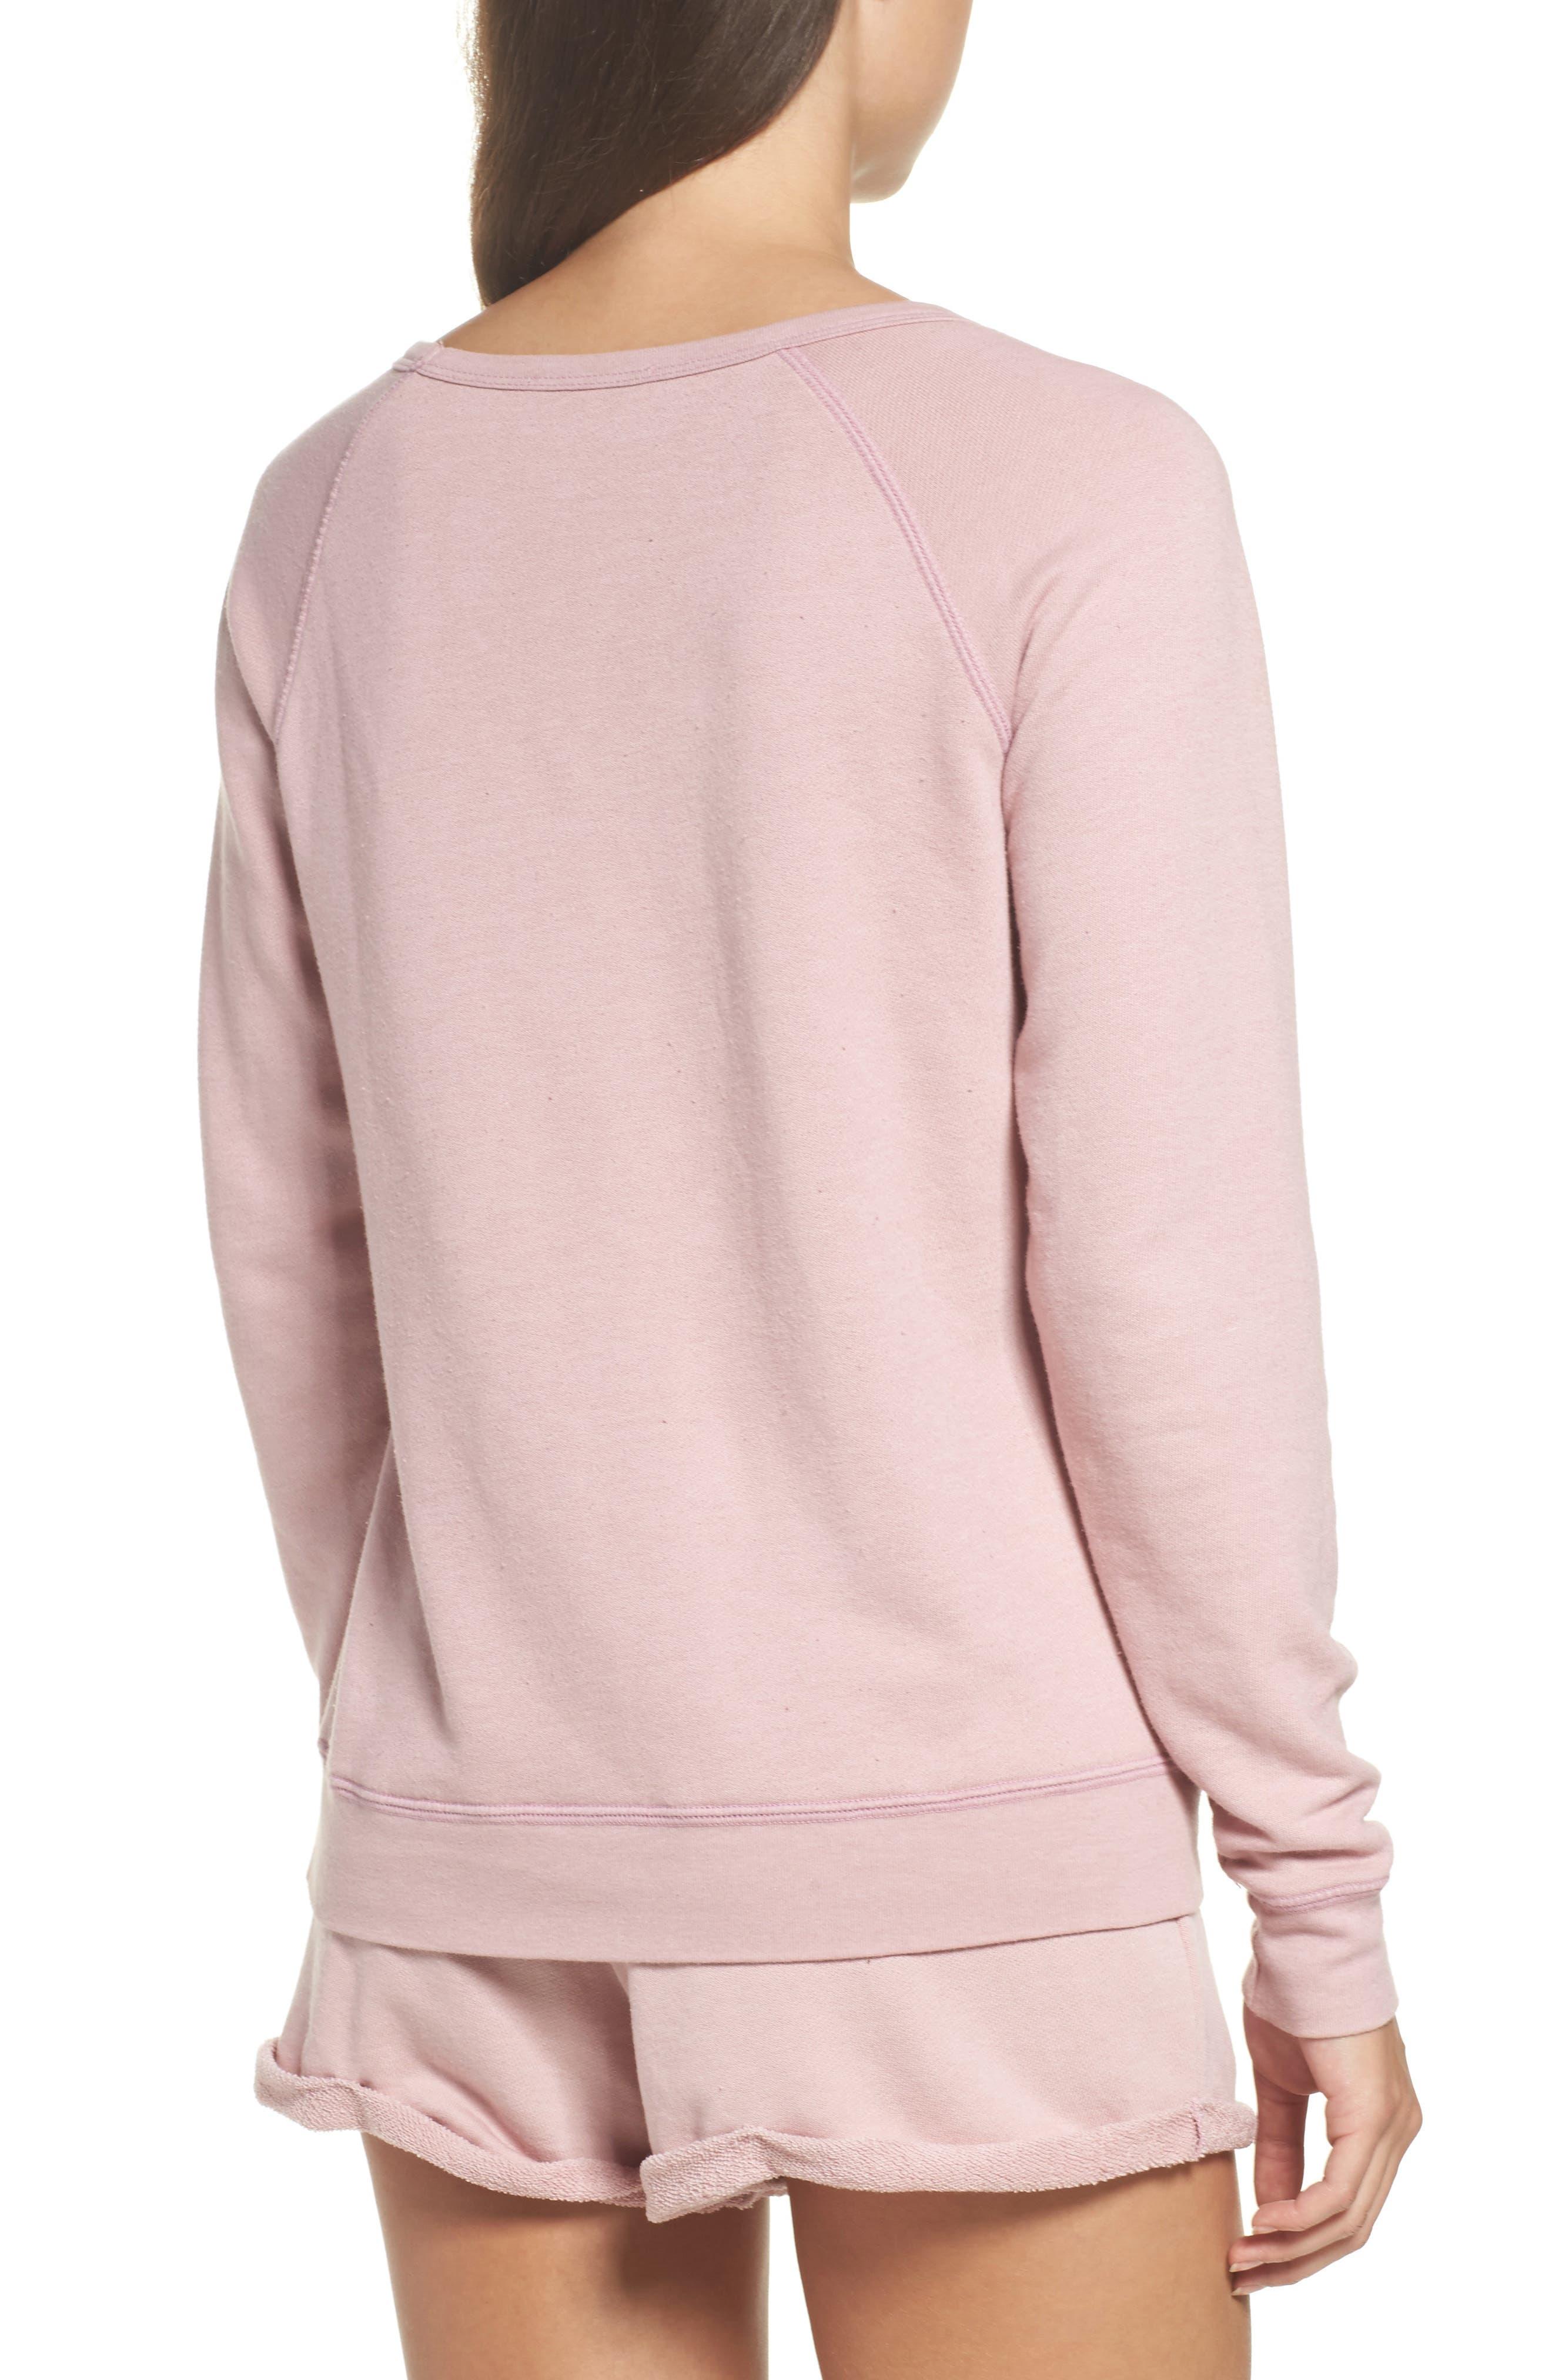 Alternate Image 2  - Junk Food Stay-Cation Sweatshirt